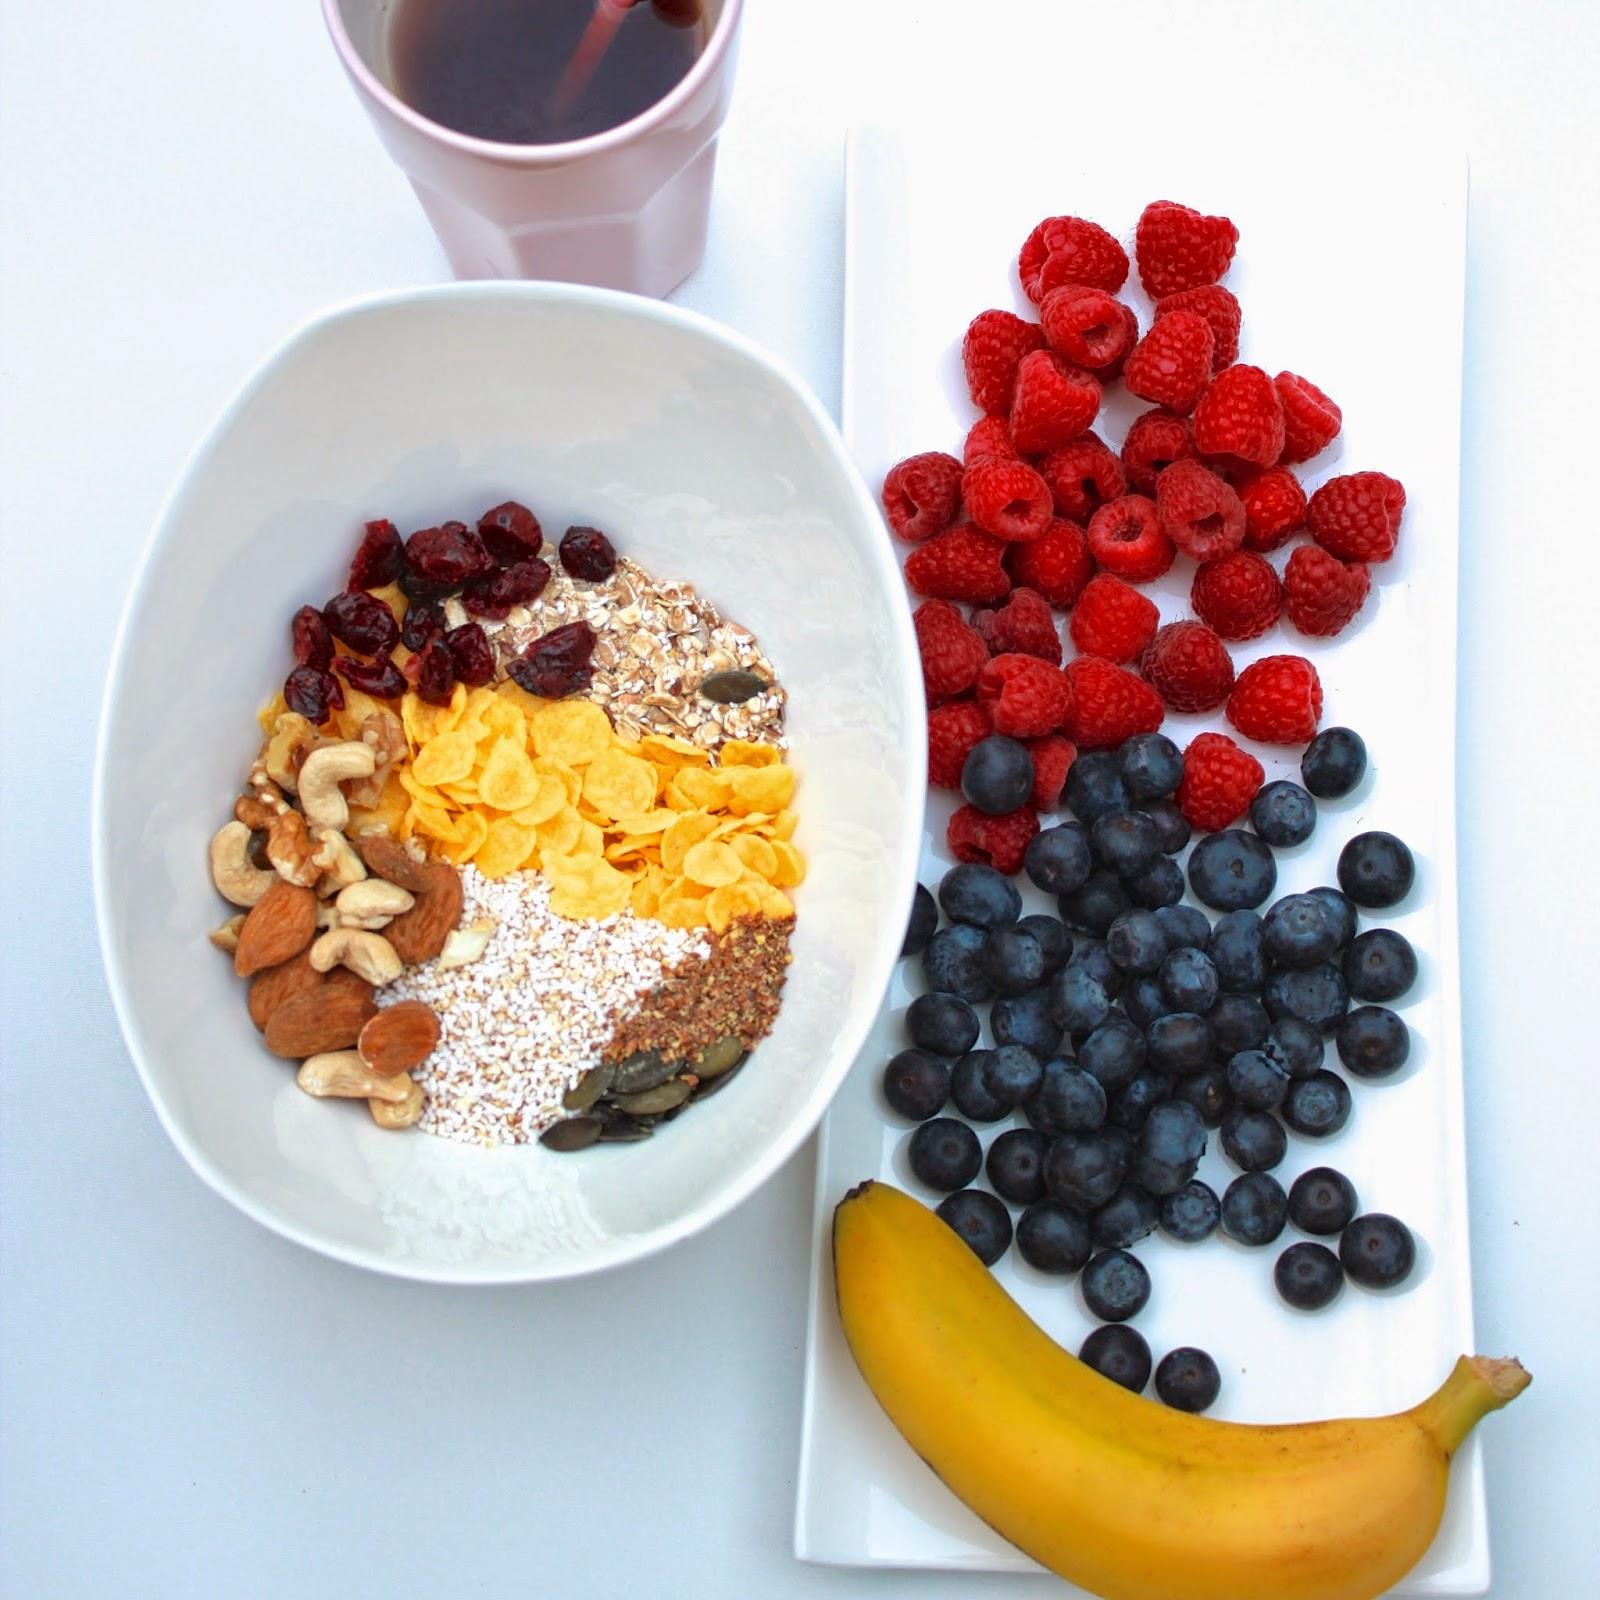 breakfast fruity goodness nowshine. Black Bedroom Furniture Sets. Home Design Ideas